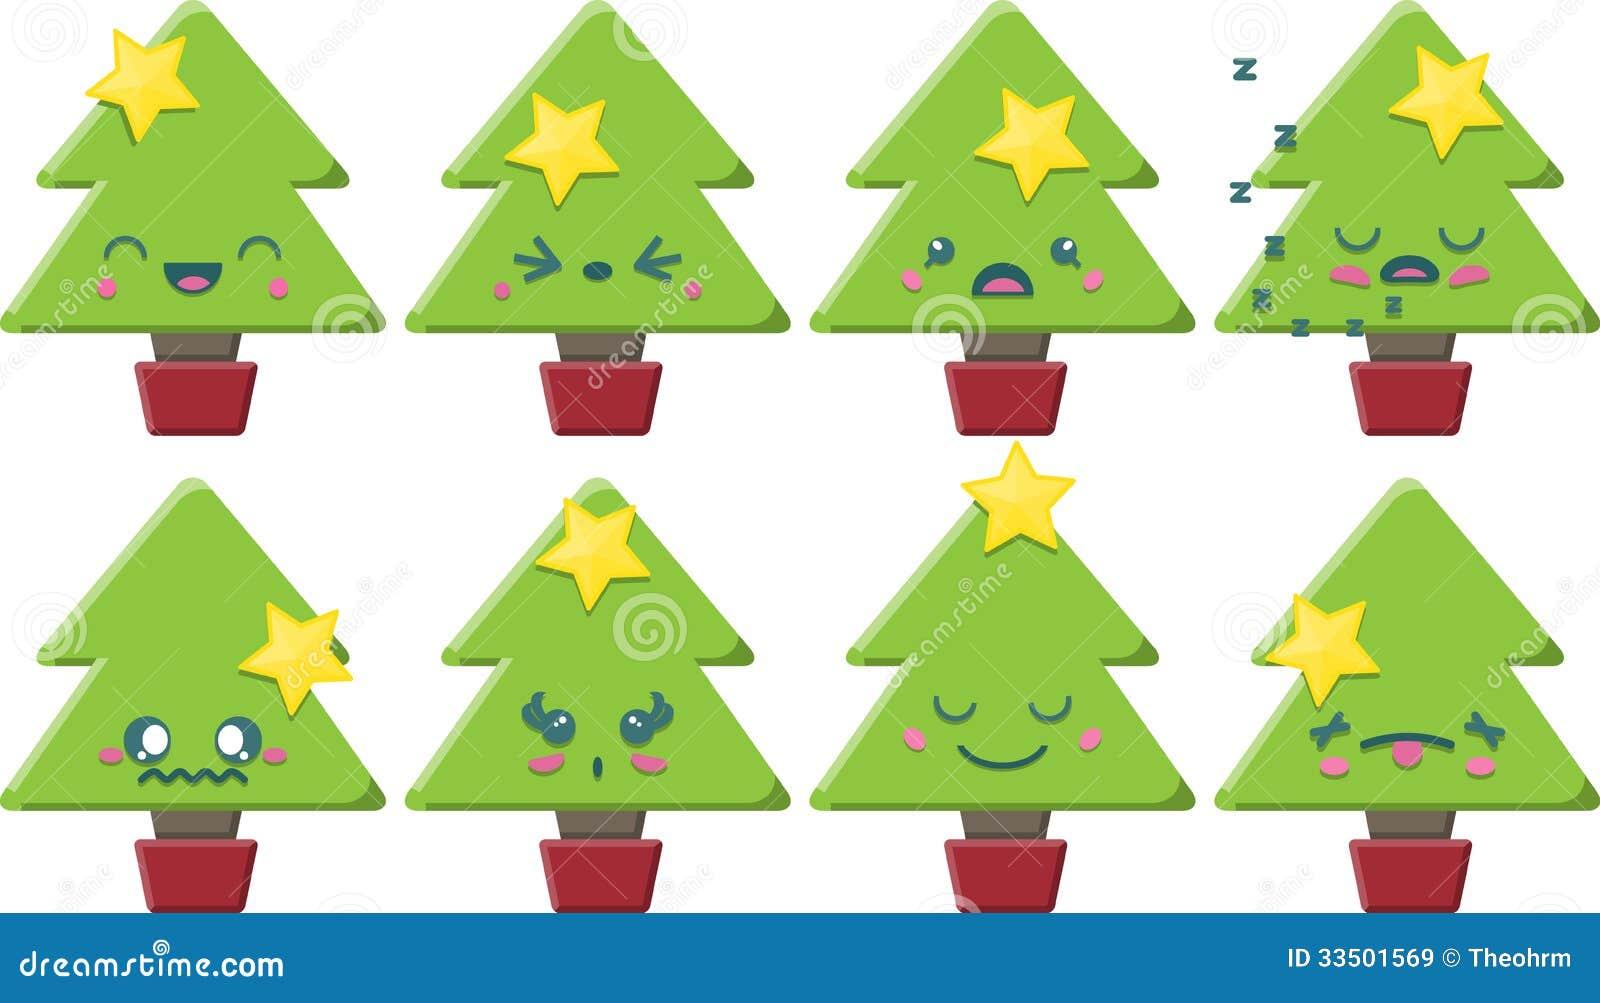 Cartoon Kawaii Christmas Tree Set Royalty Free Stock Images ...